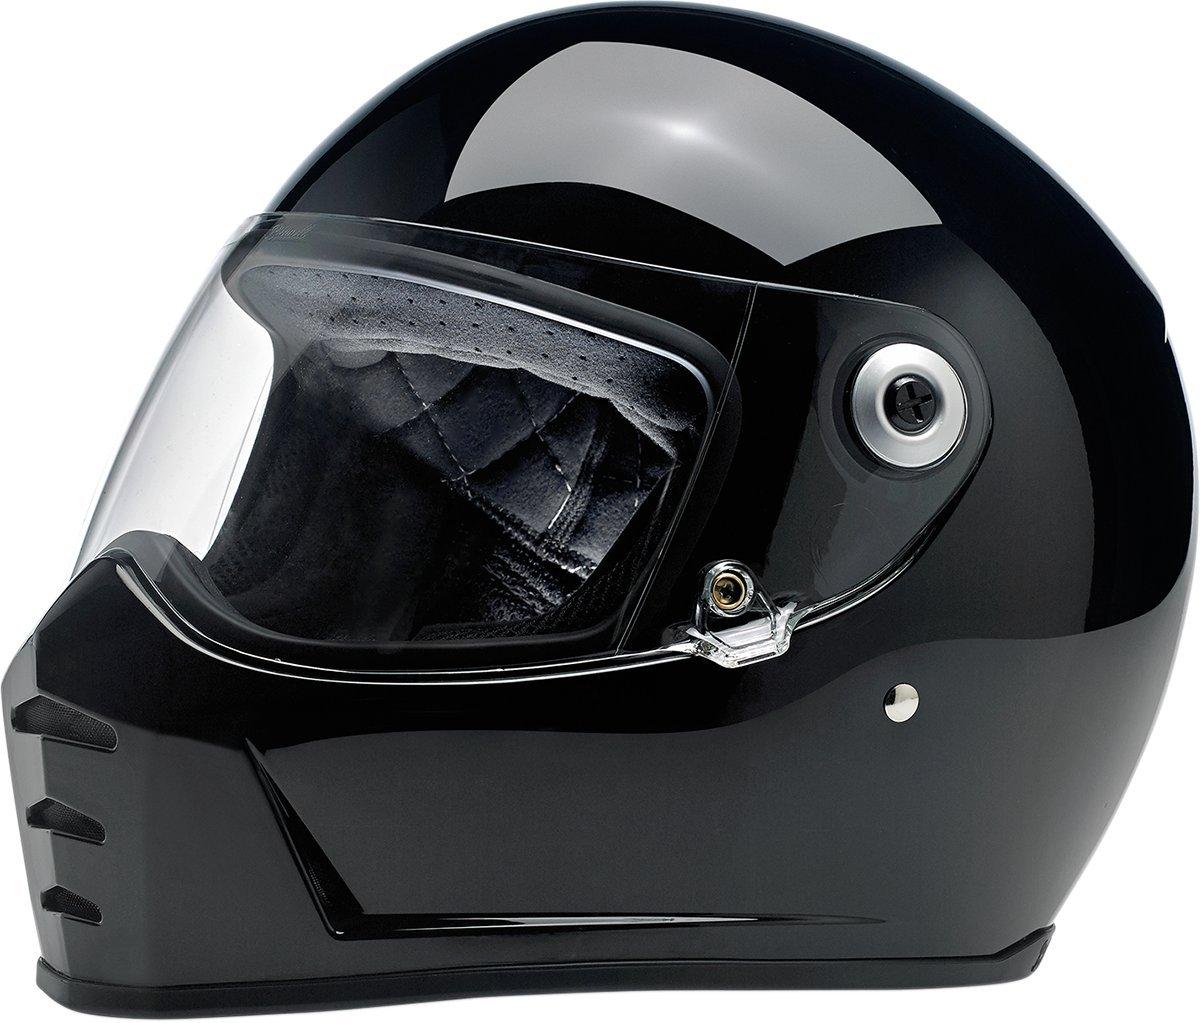 Biltwell Lane divisor s/ólido Full-Face/ /Casco de Moto Negro Brillante